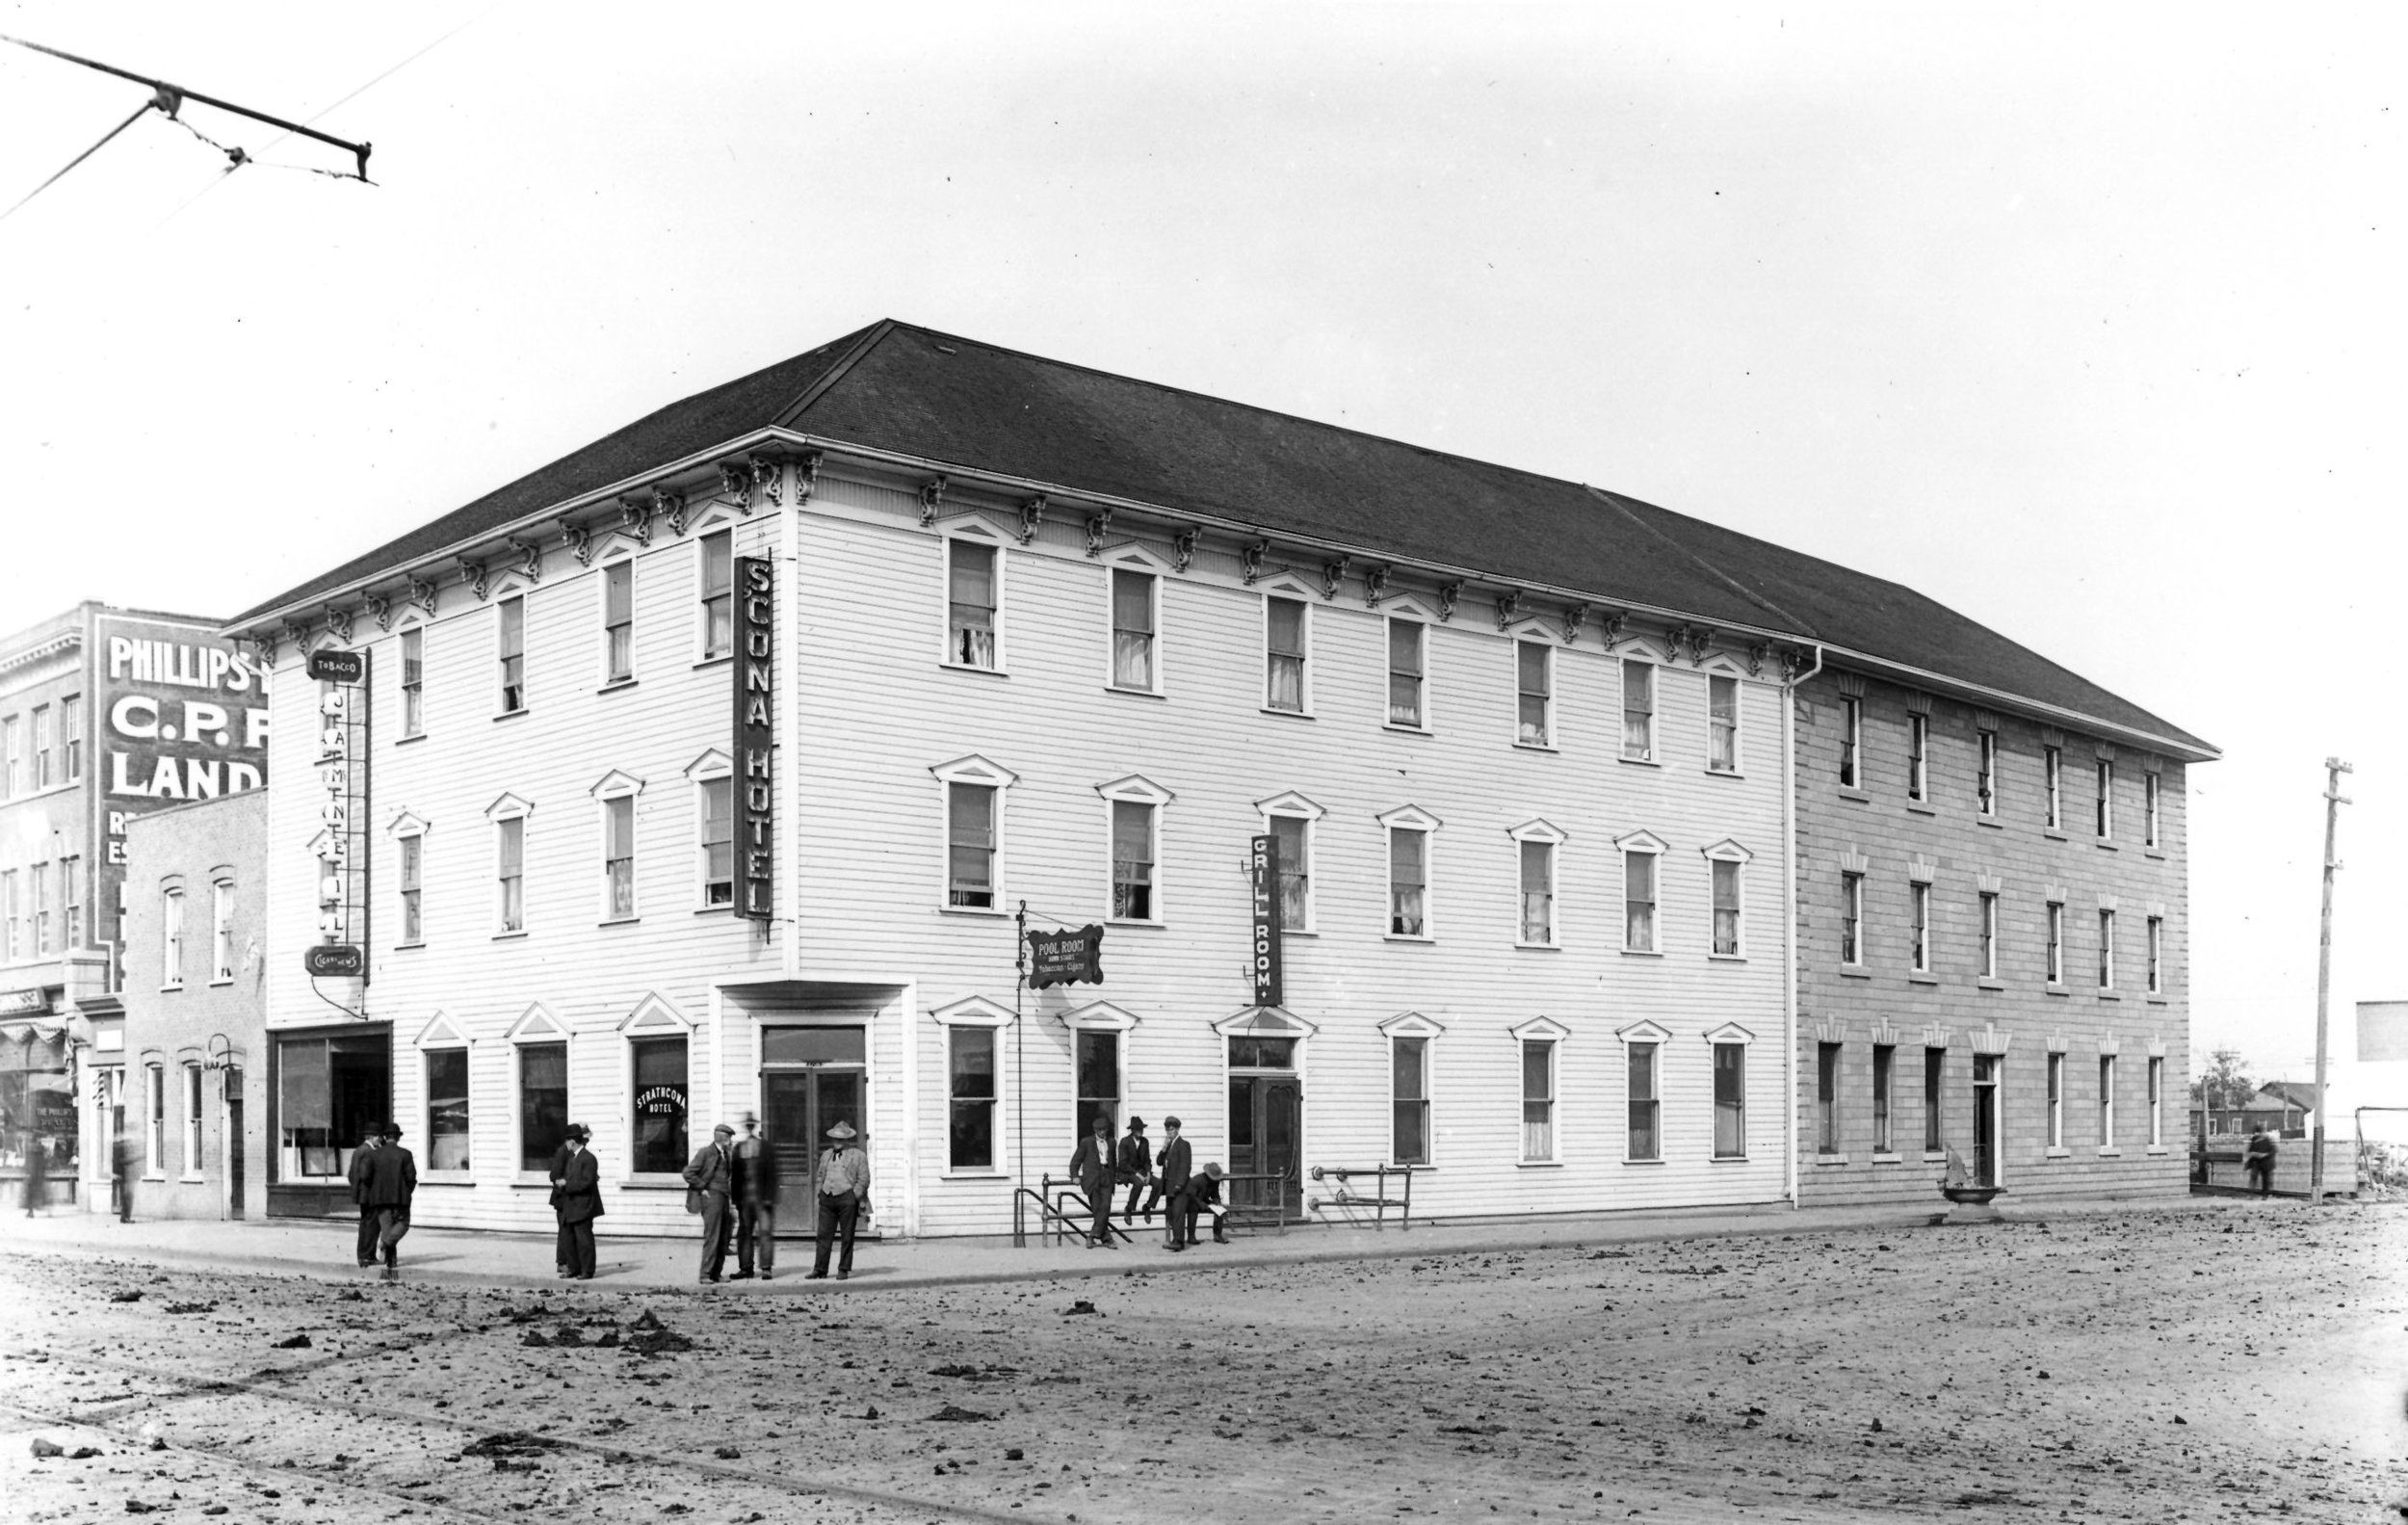 Hist Photo - BW - 1912.jpg